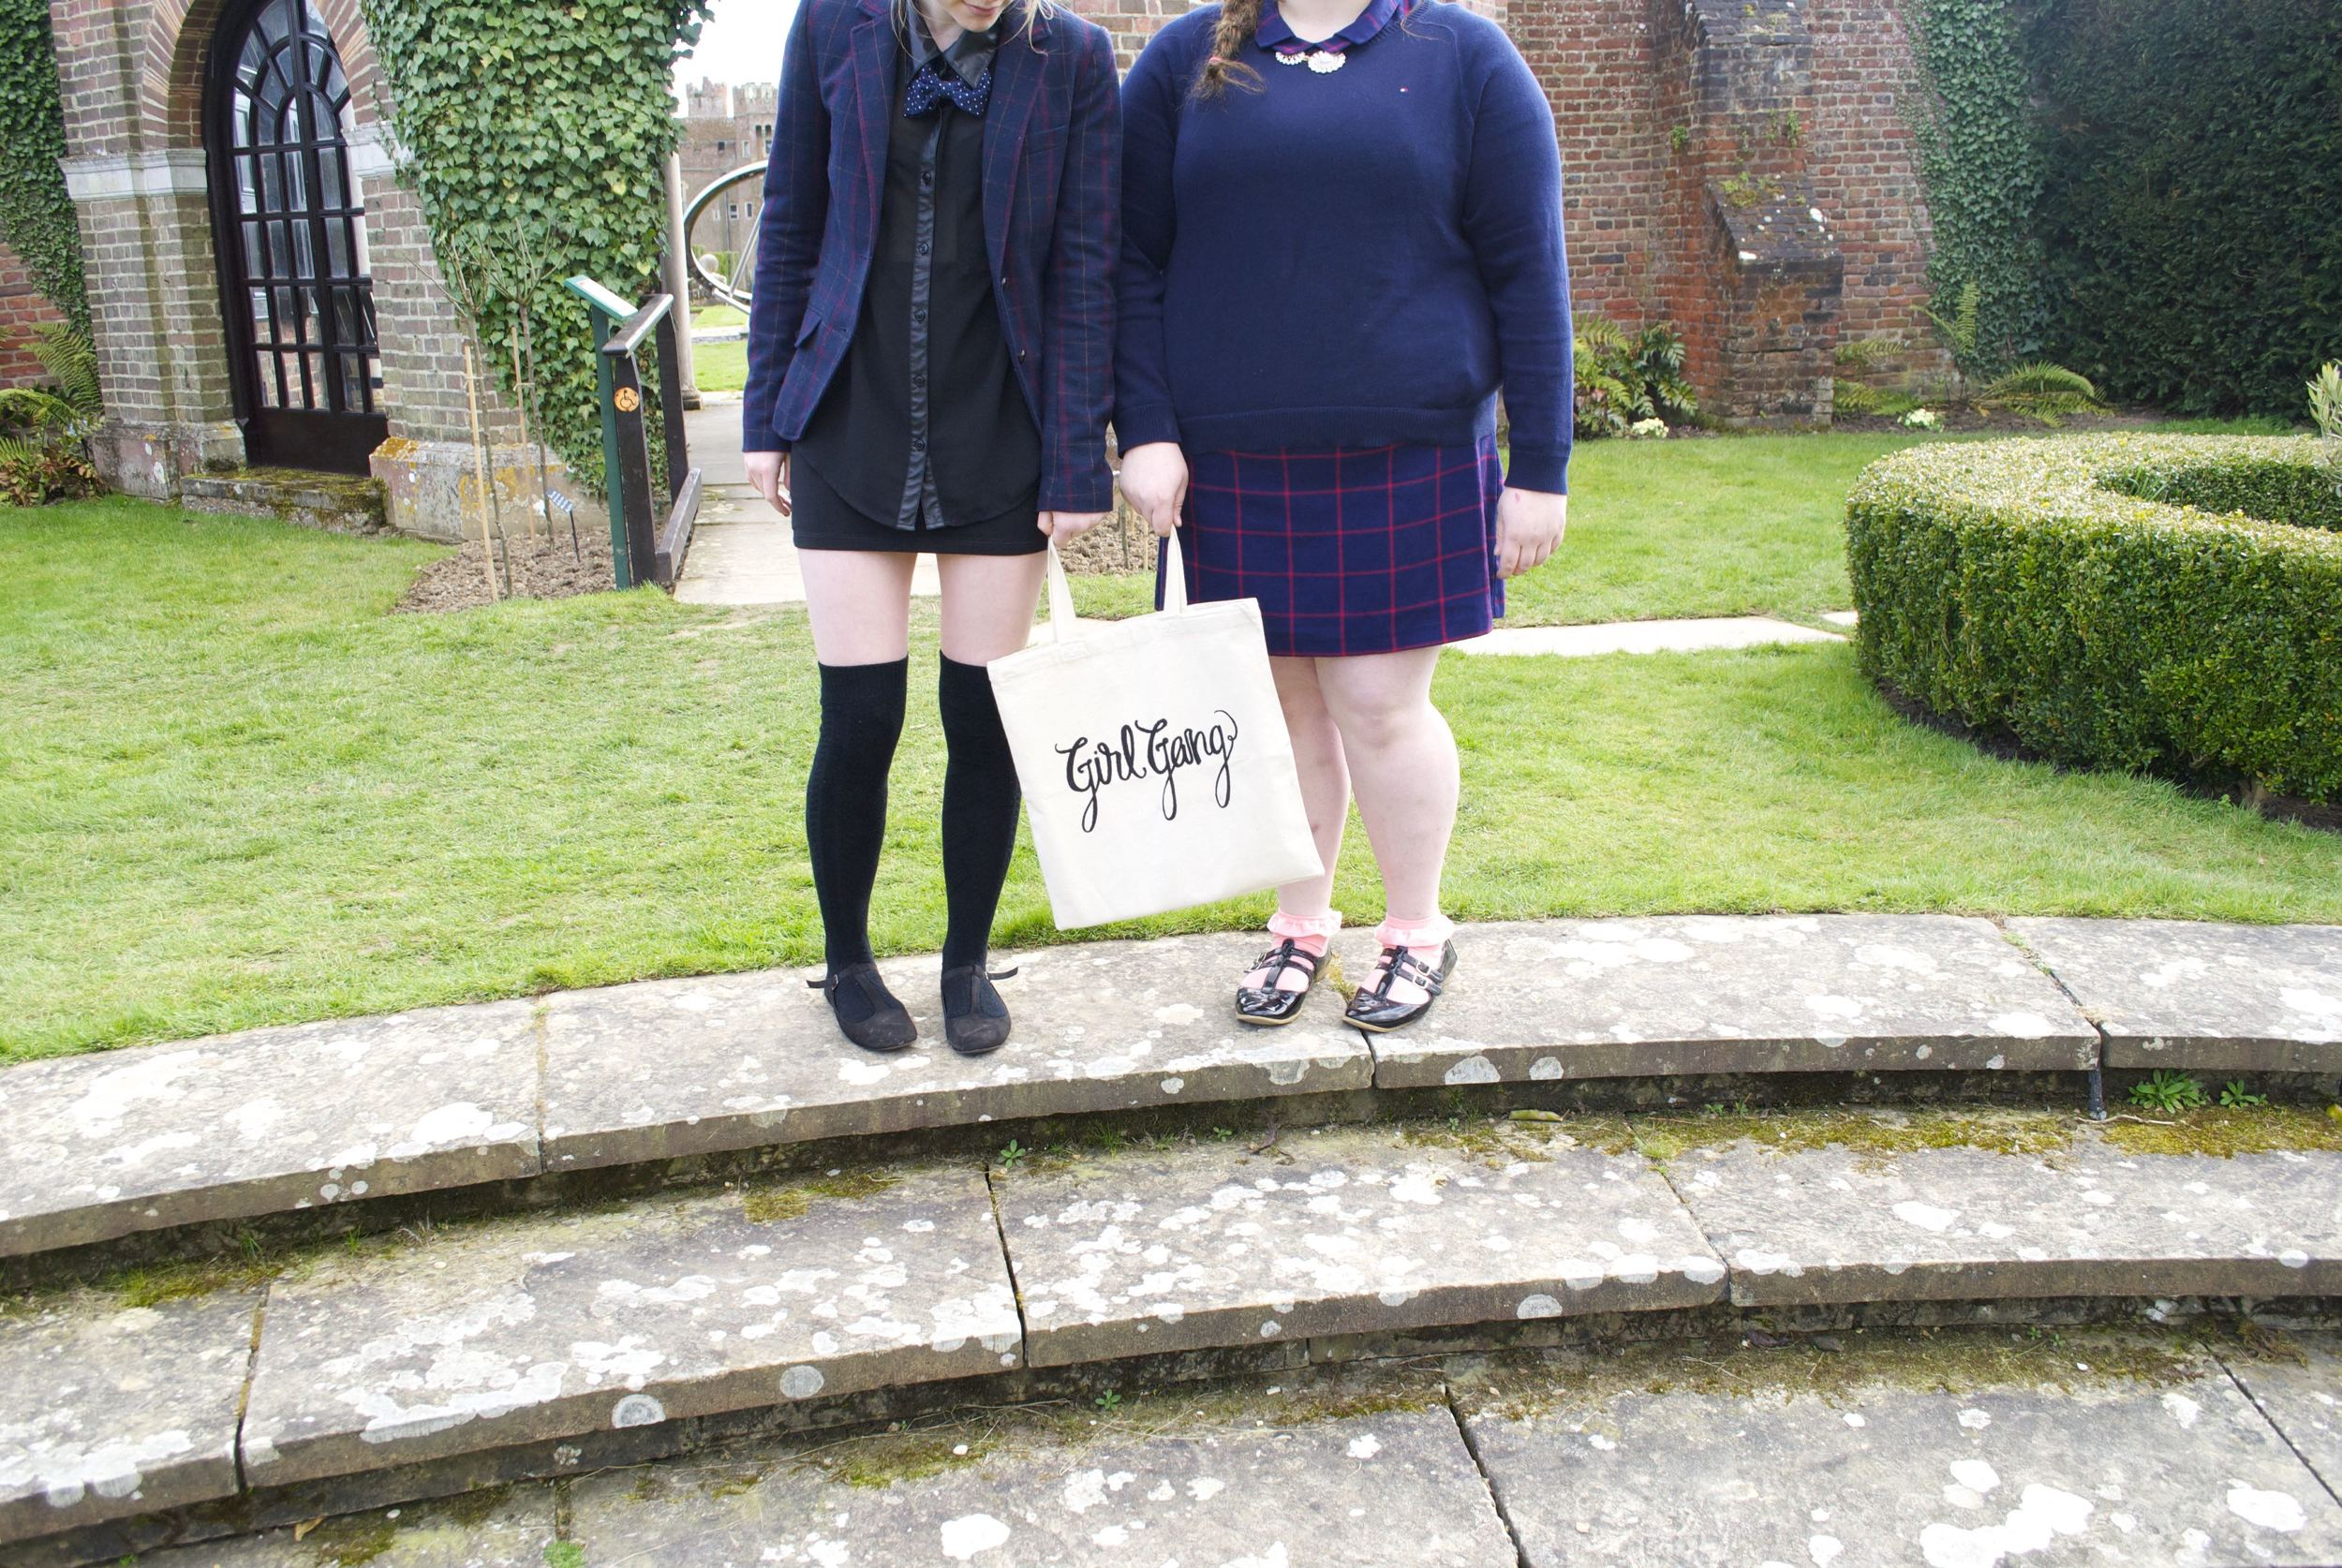 GG58 - Haley, Kelsey : Maddy : Haley.jpg